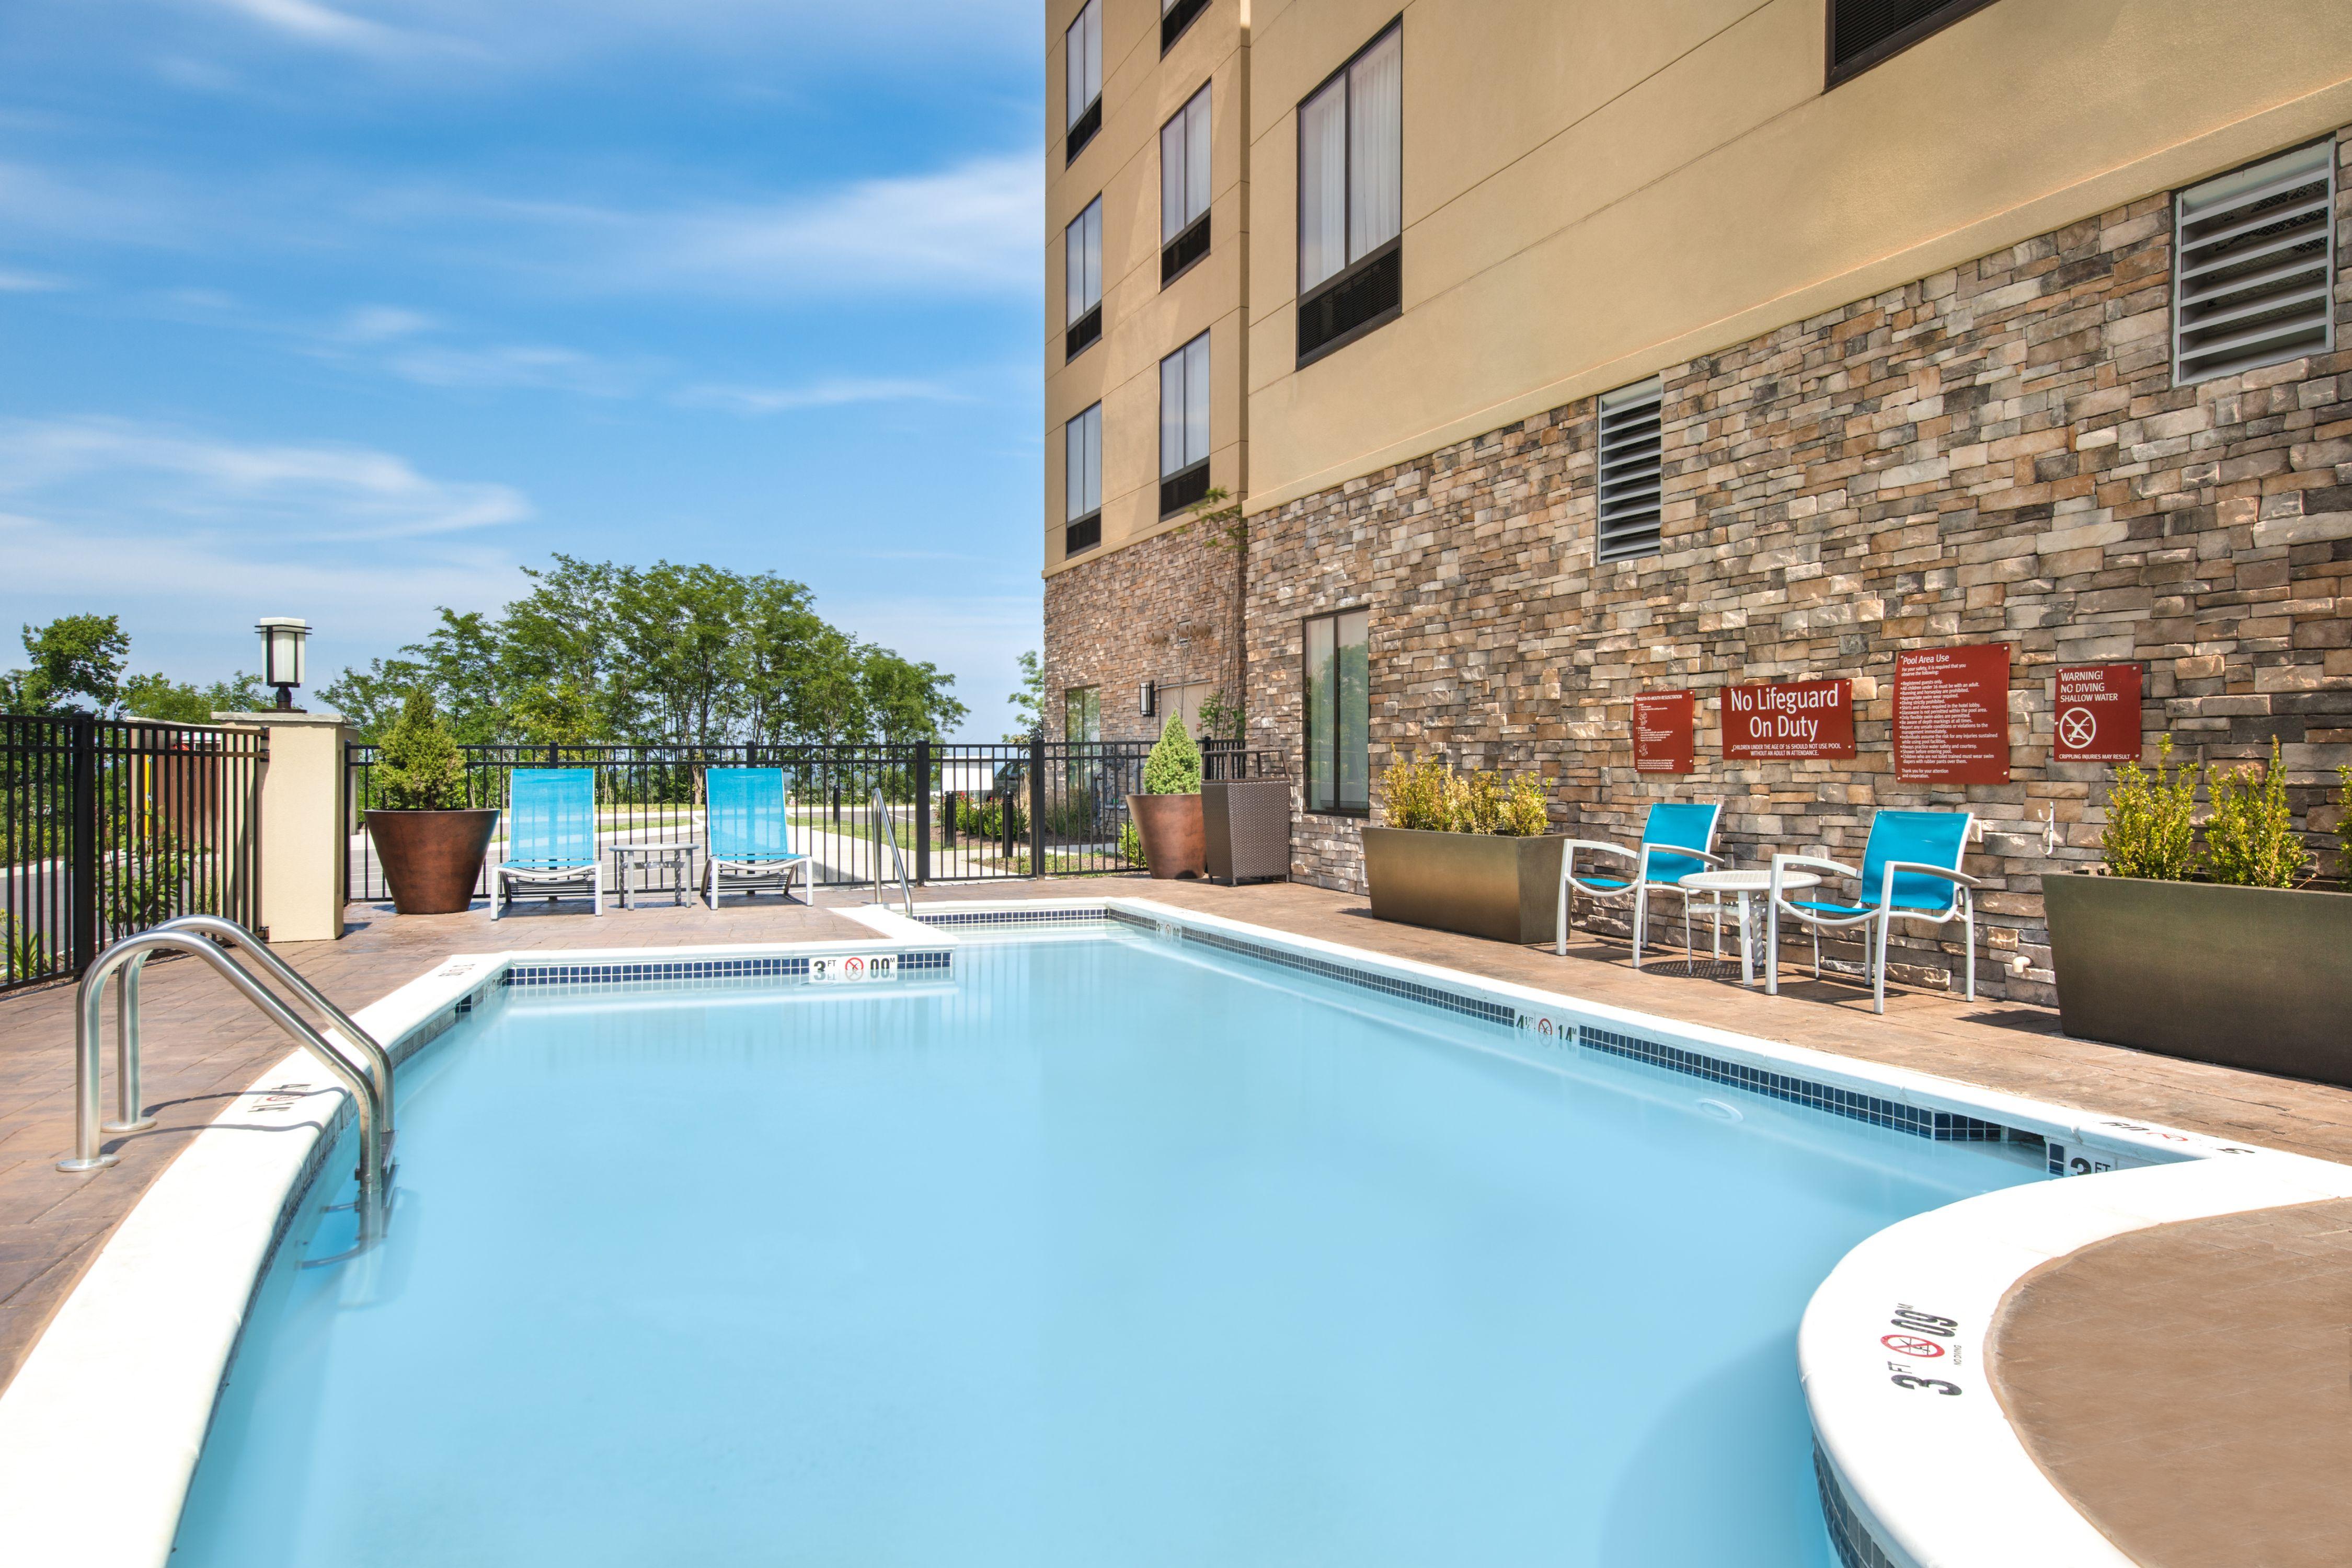 TownePlace Suites by Marriott Nashville Smyrna image 5